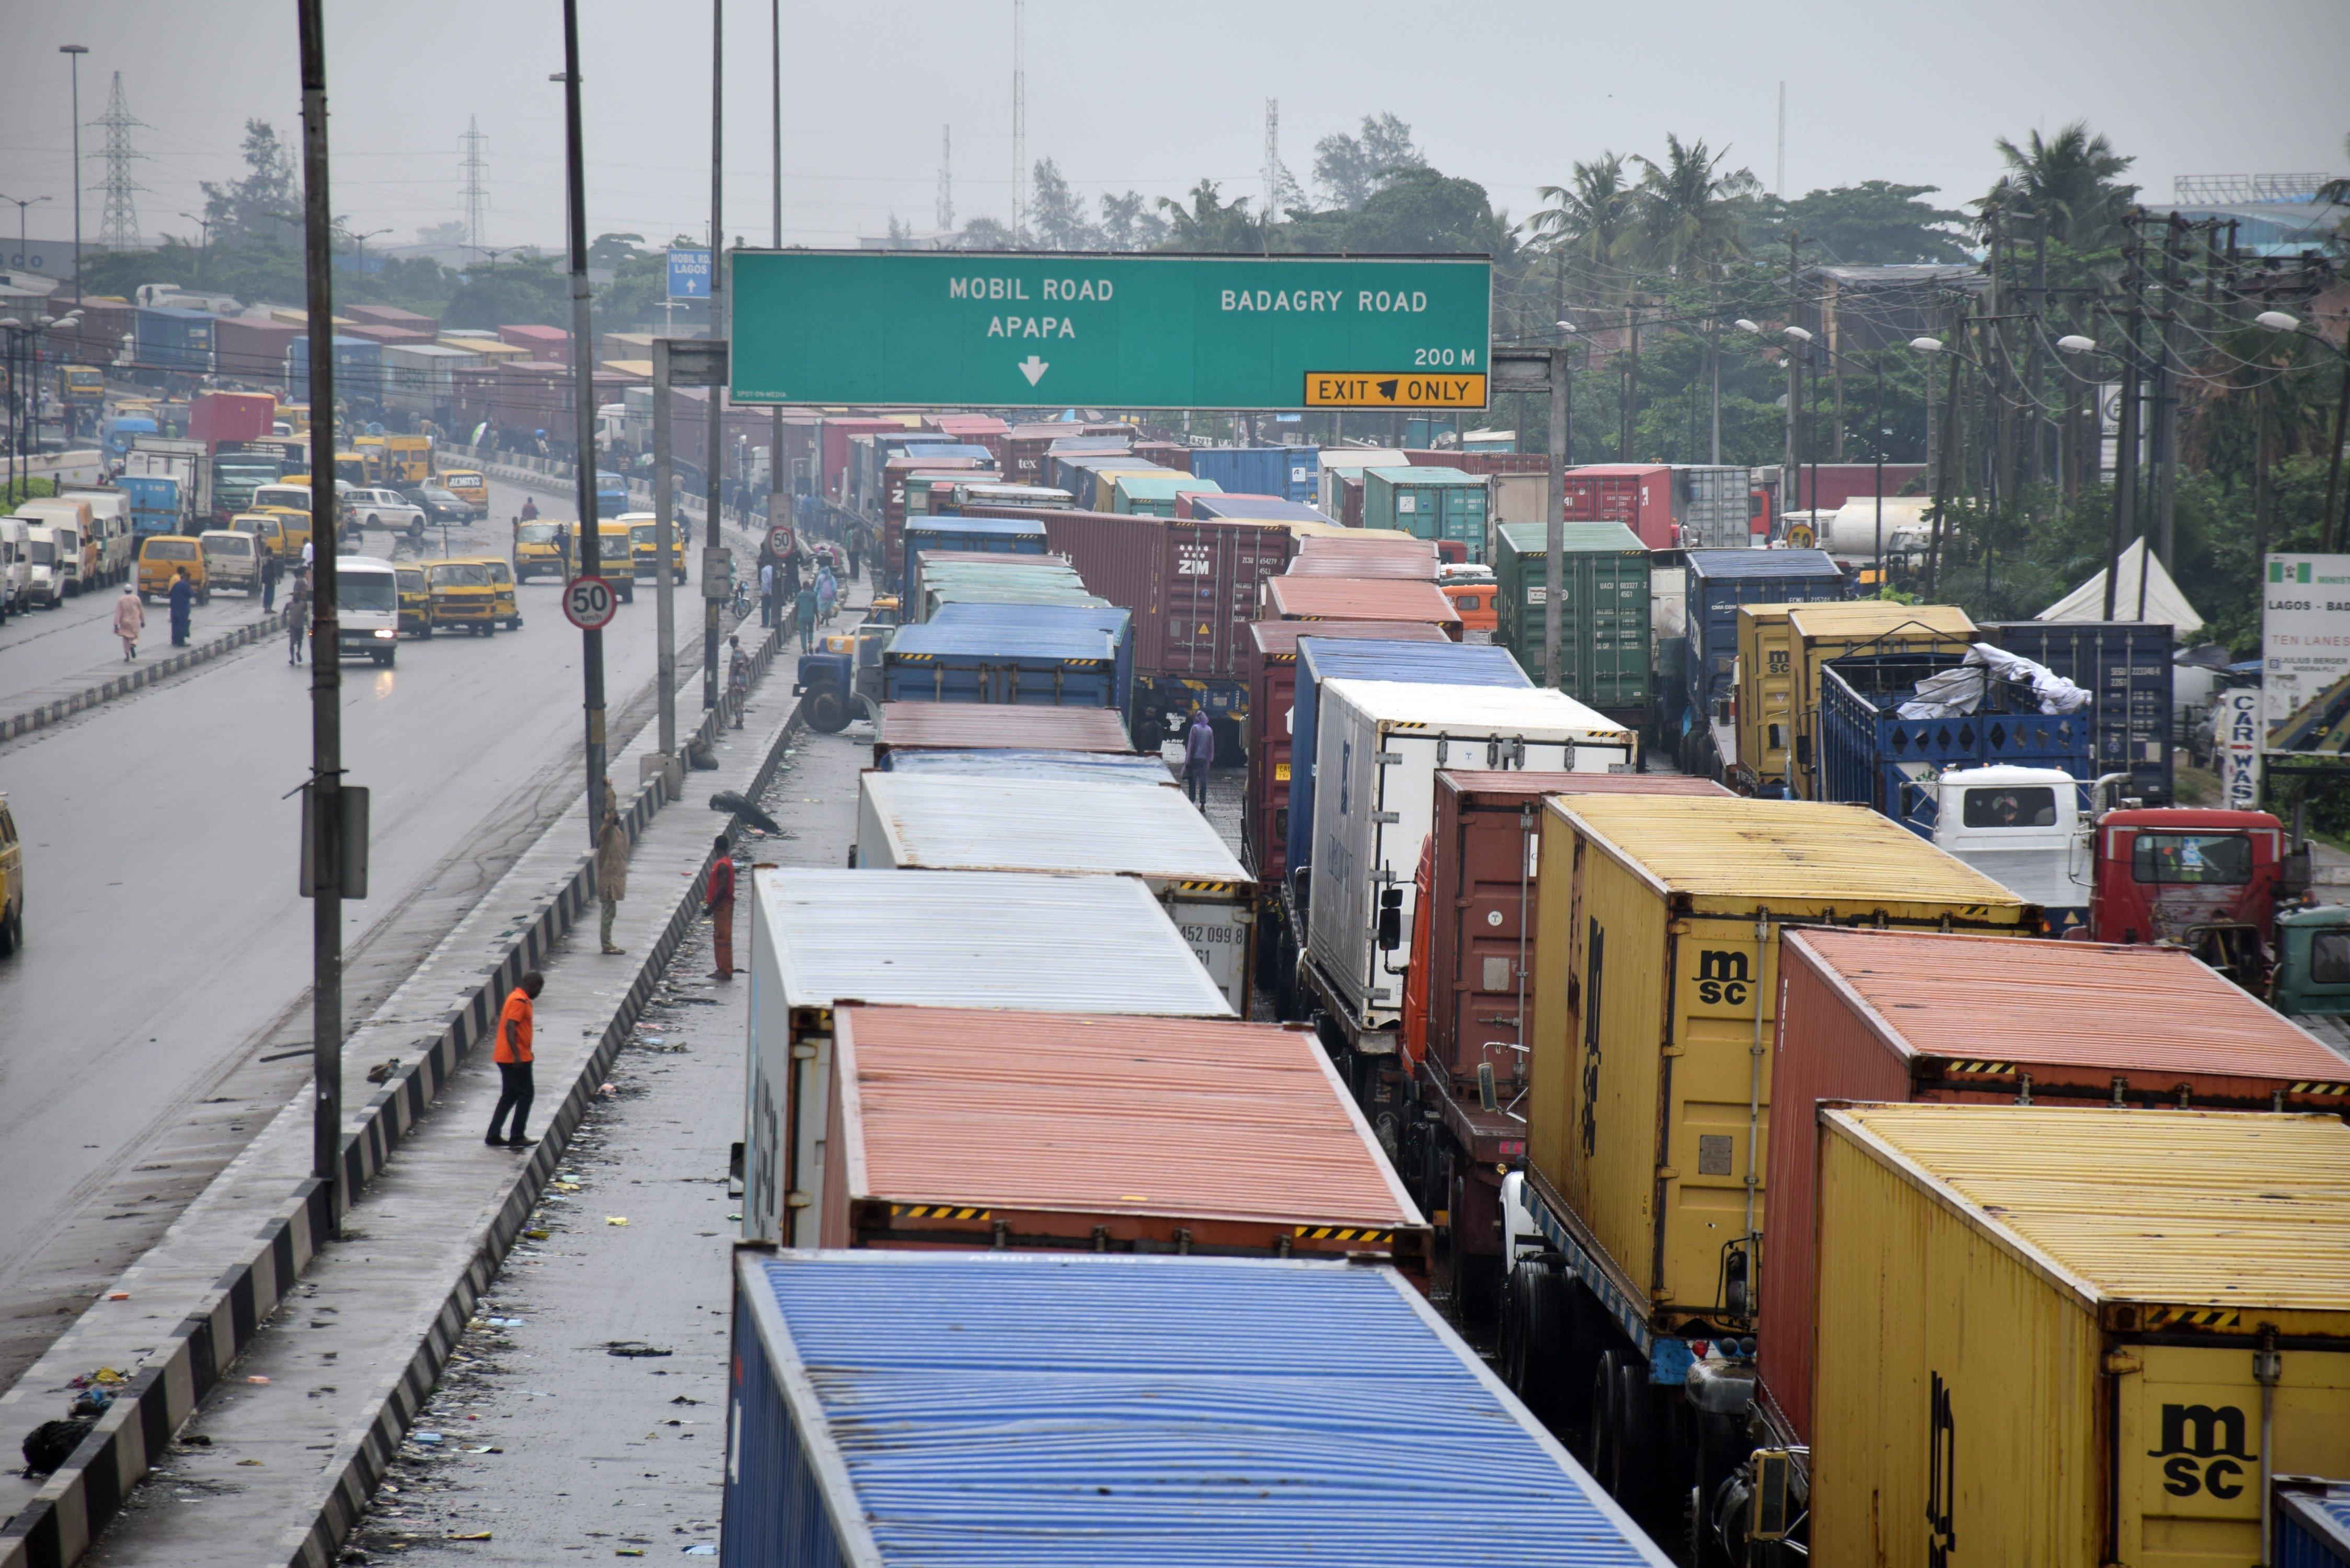 Resurgence of Apapa Traffic Gridlock: Causes, Remedy